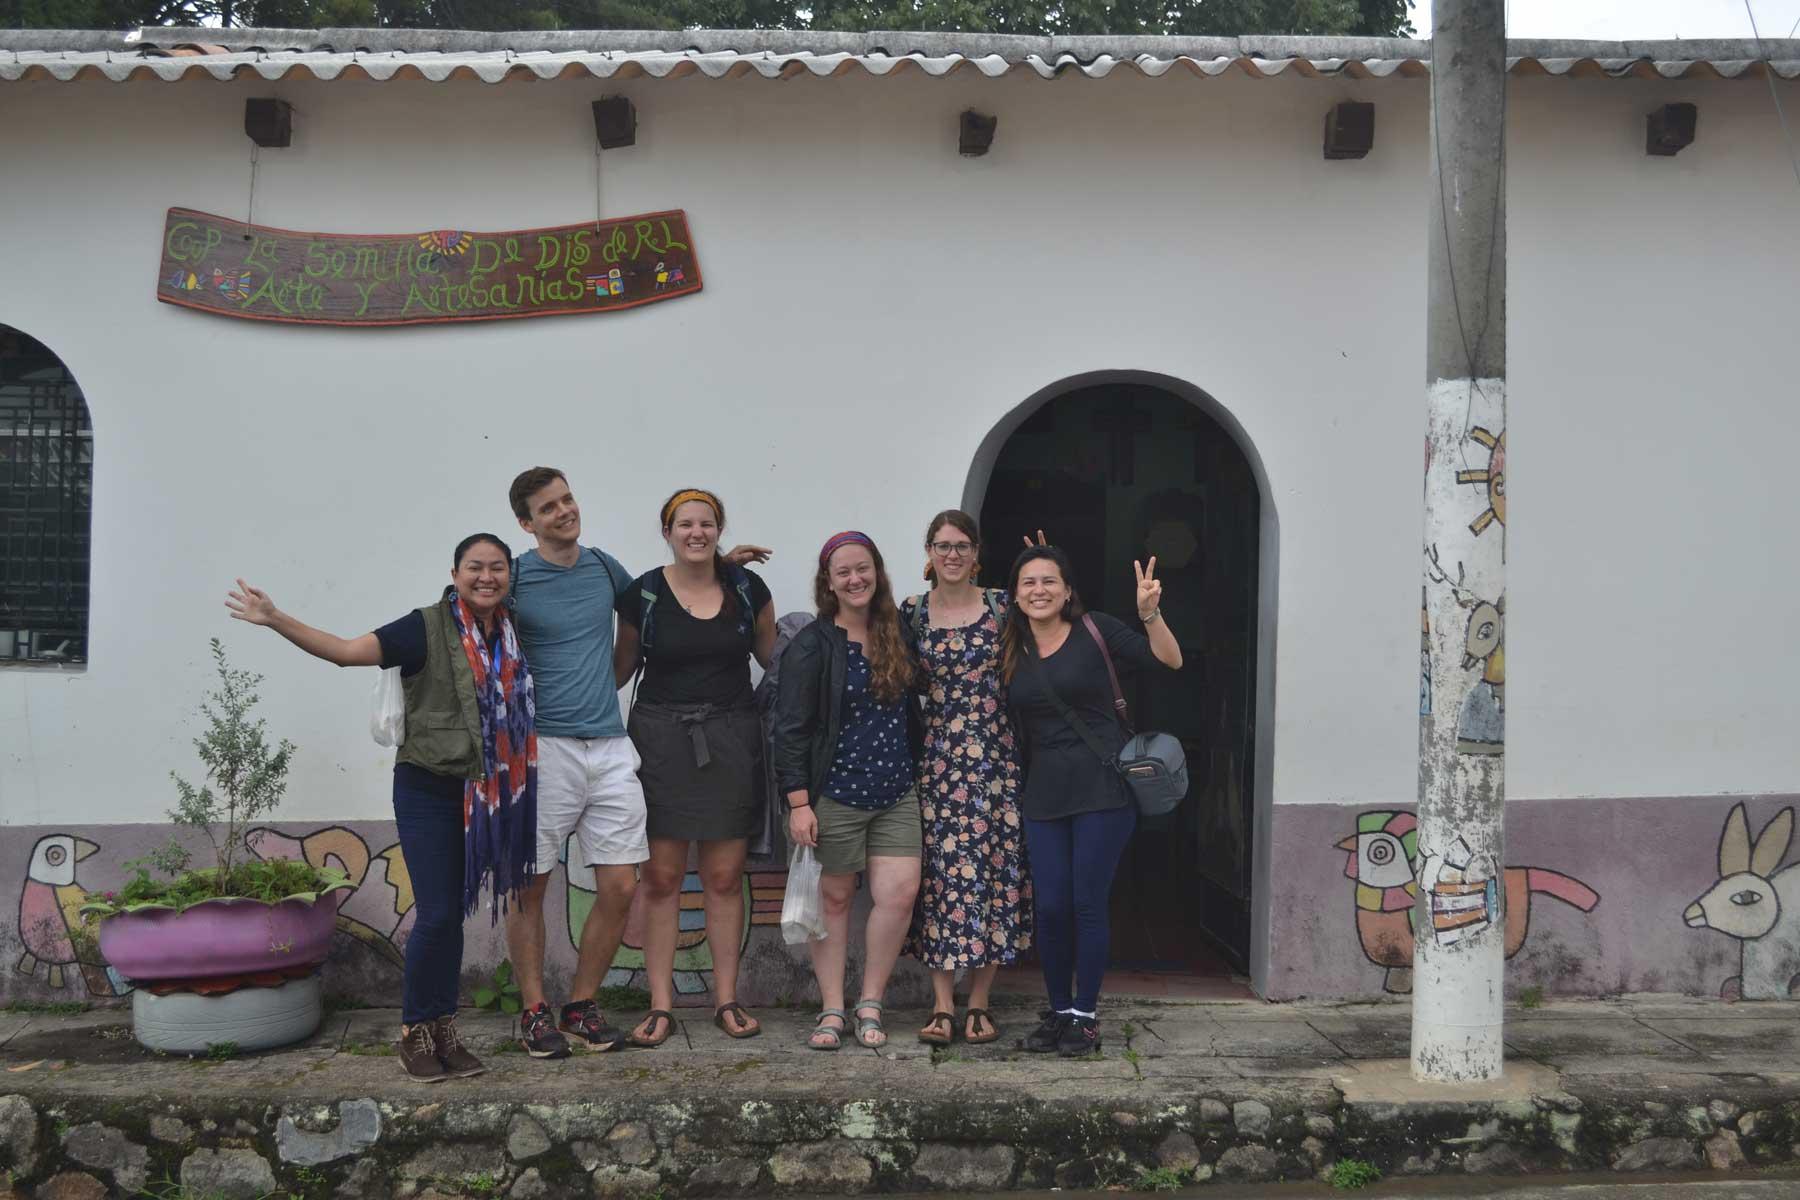 La Palma - Cultural activities, CoCoDA